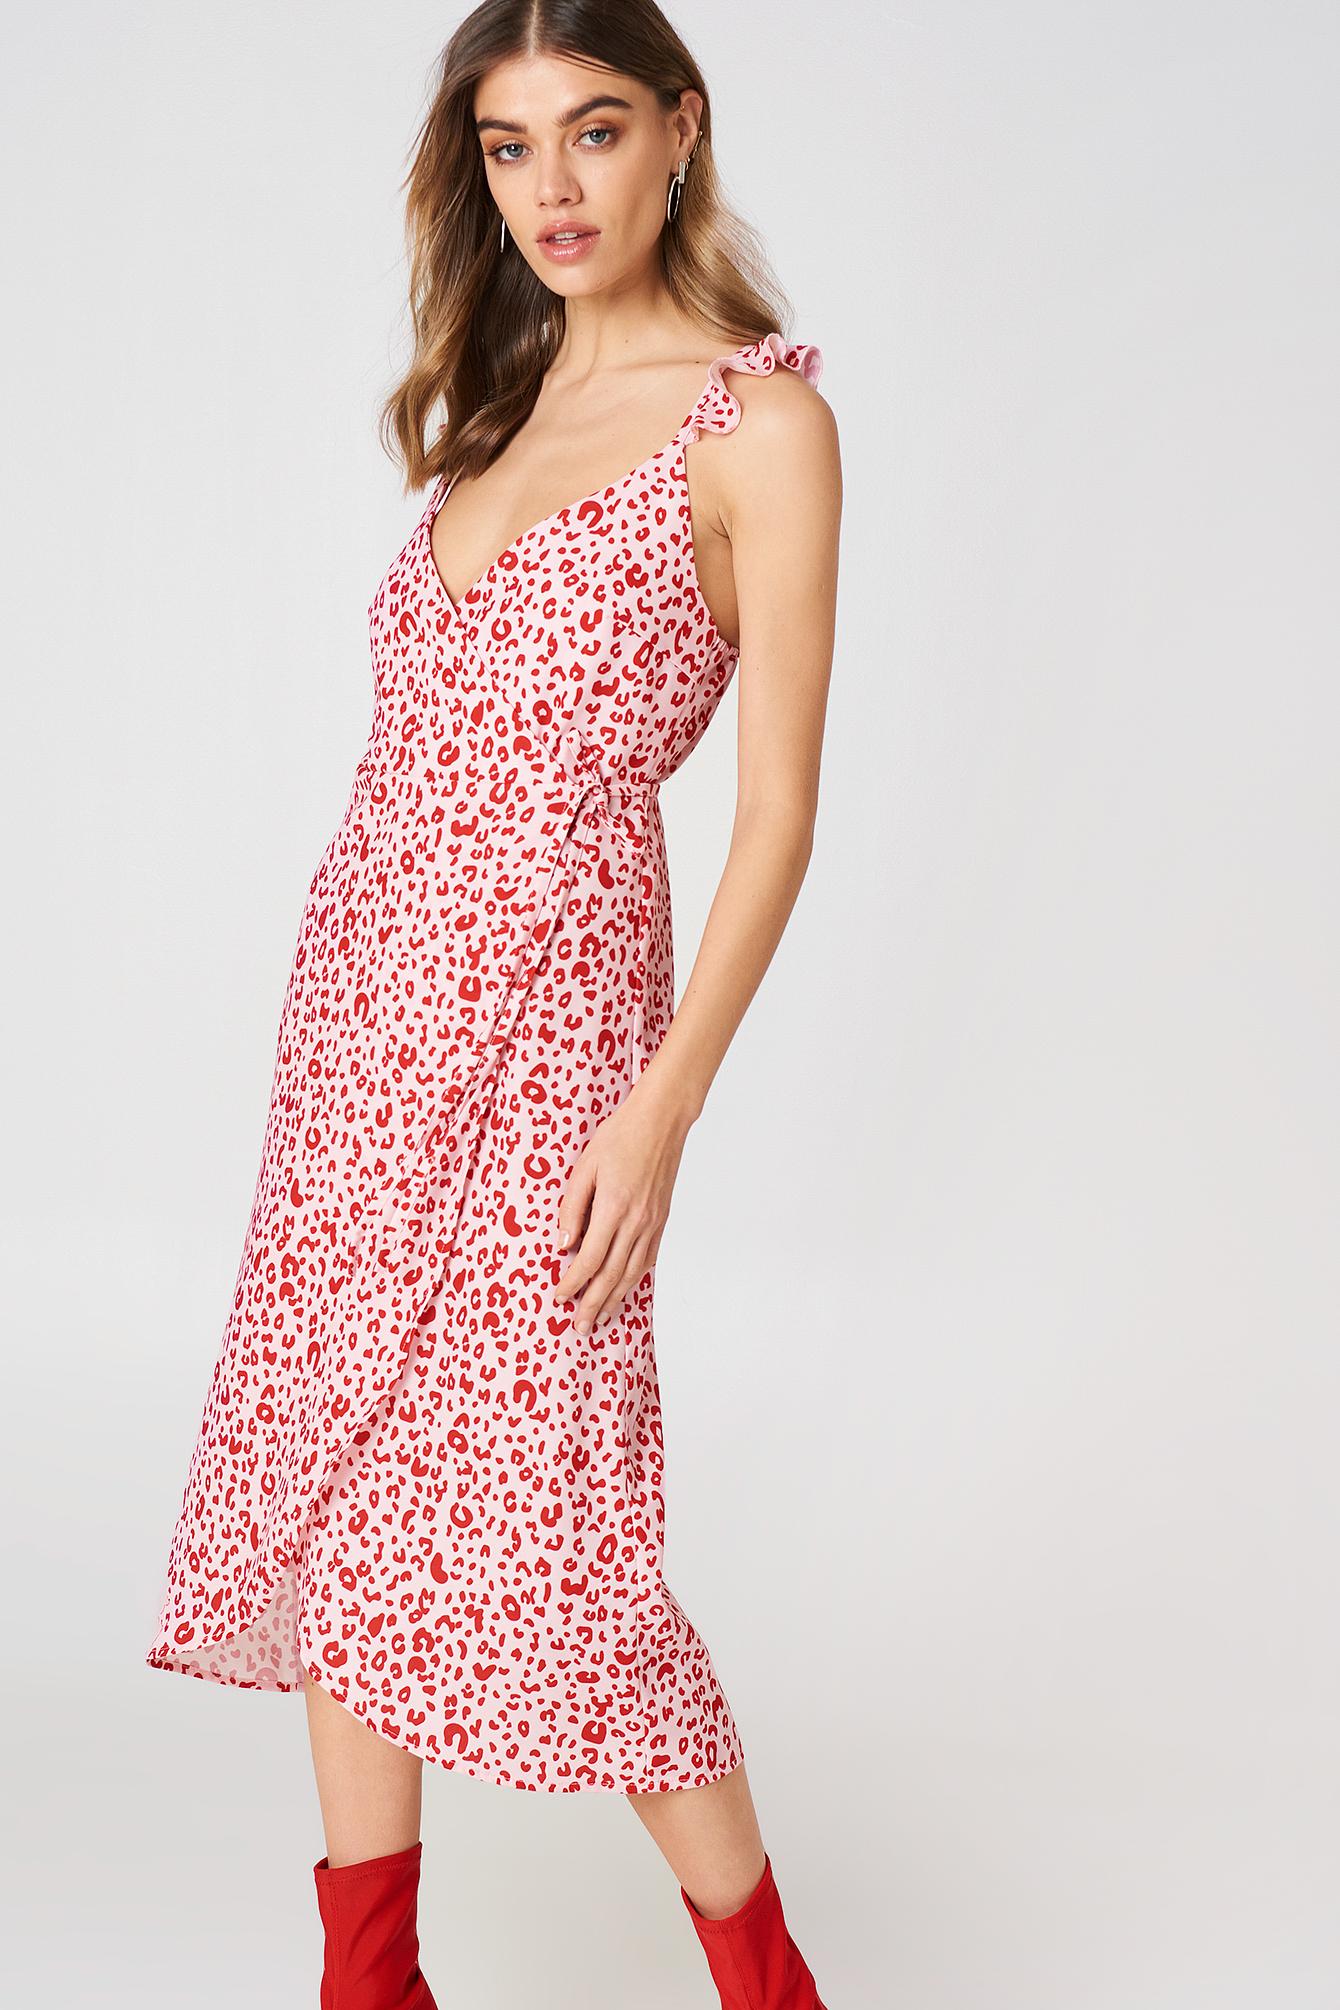 Dresses   Women\'s Dresses Online   na-kd.com